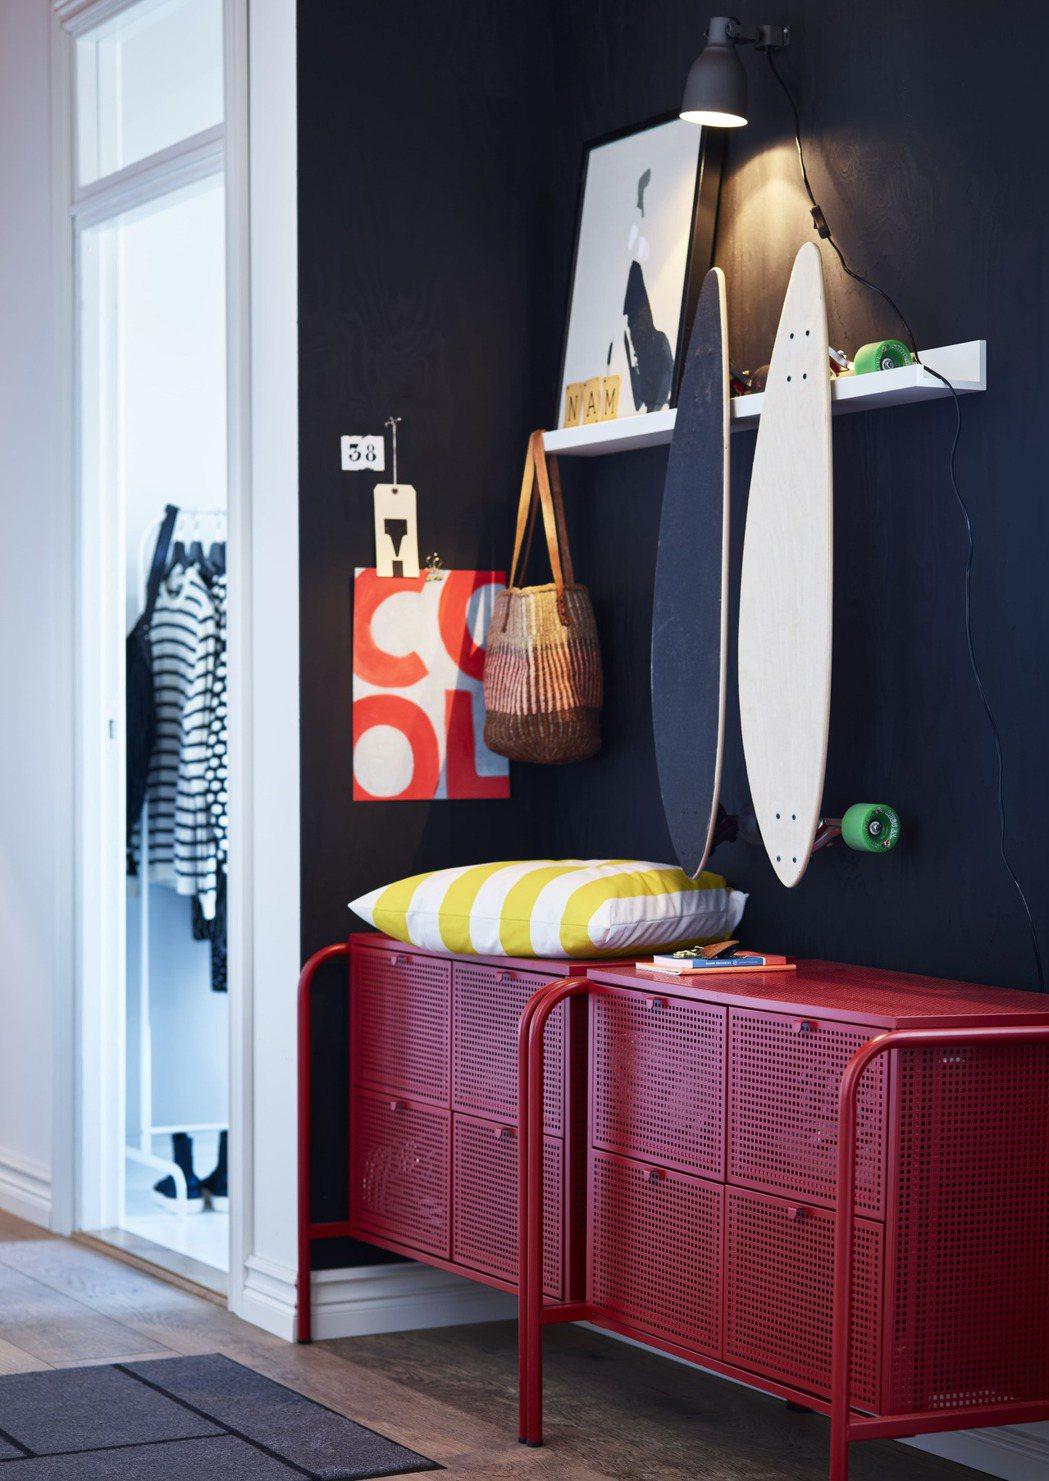 IKEA今年推出多款用色鮮明的單品,強調「夠大膽、才精彩」的色彩美學!新品NIK...